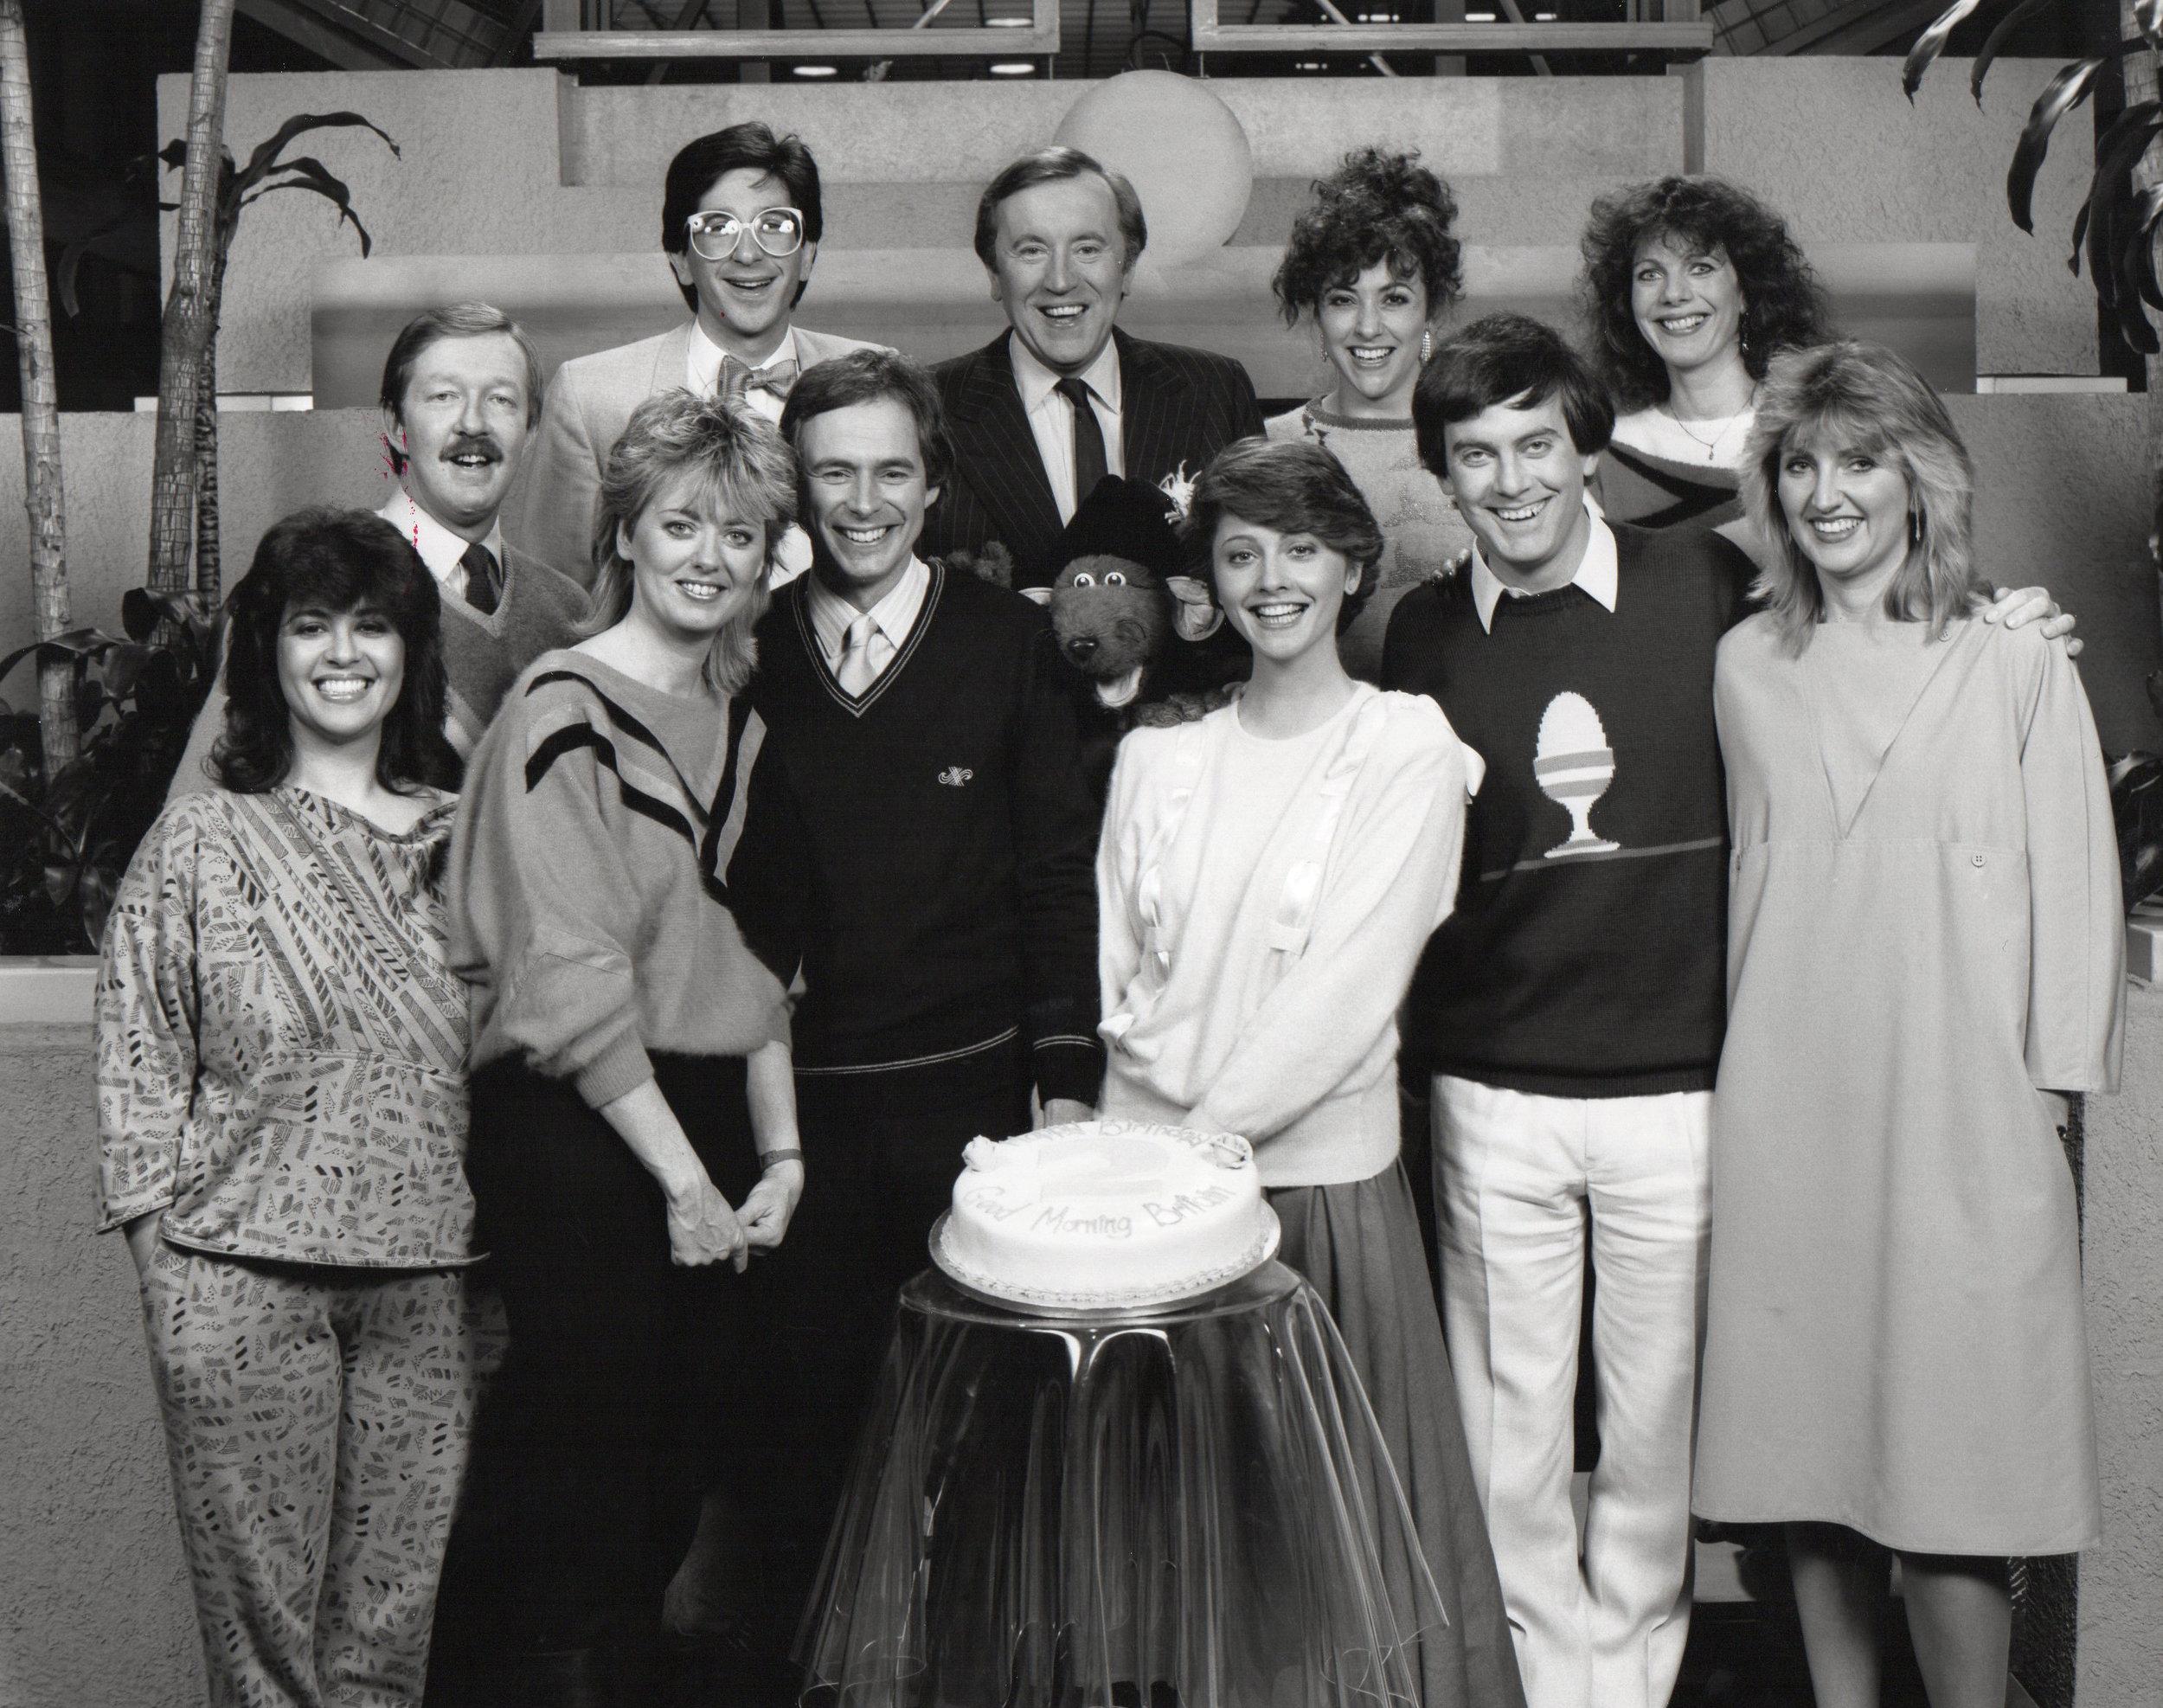 The TV-am team celebrates its second birthday, 1985